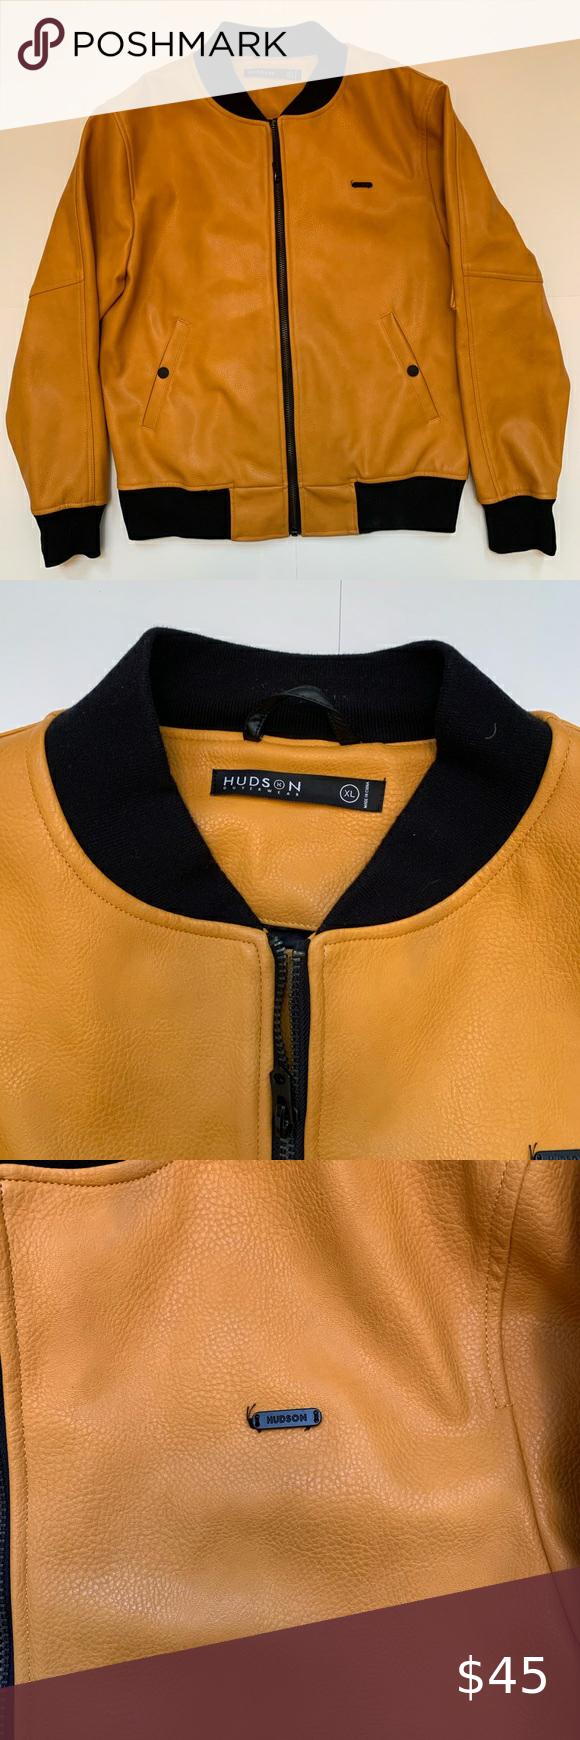 Hudson Outerwear Hudson Outerwear Jacket Hudson Jeans Jackets Coats Fashion Clothes Design Outerwear Jackets [ 1740 x 580 Pixel ]